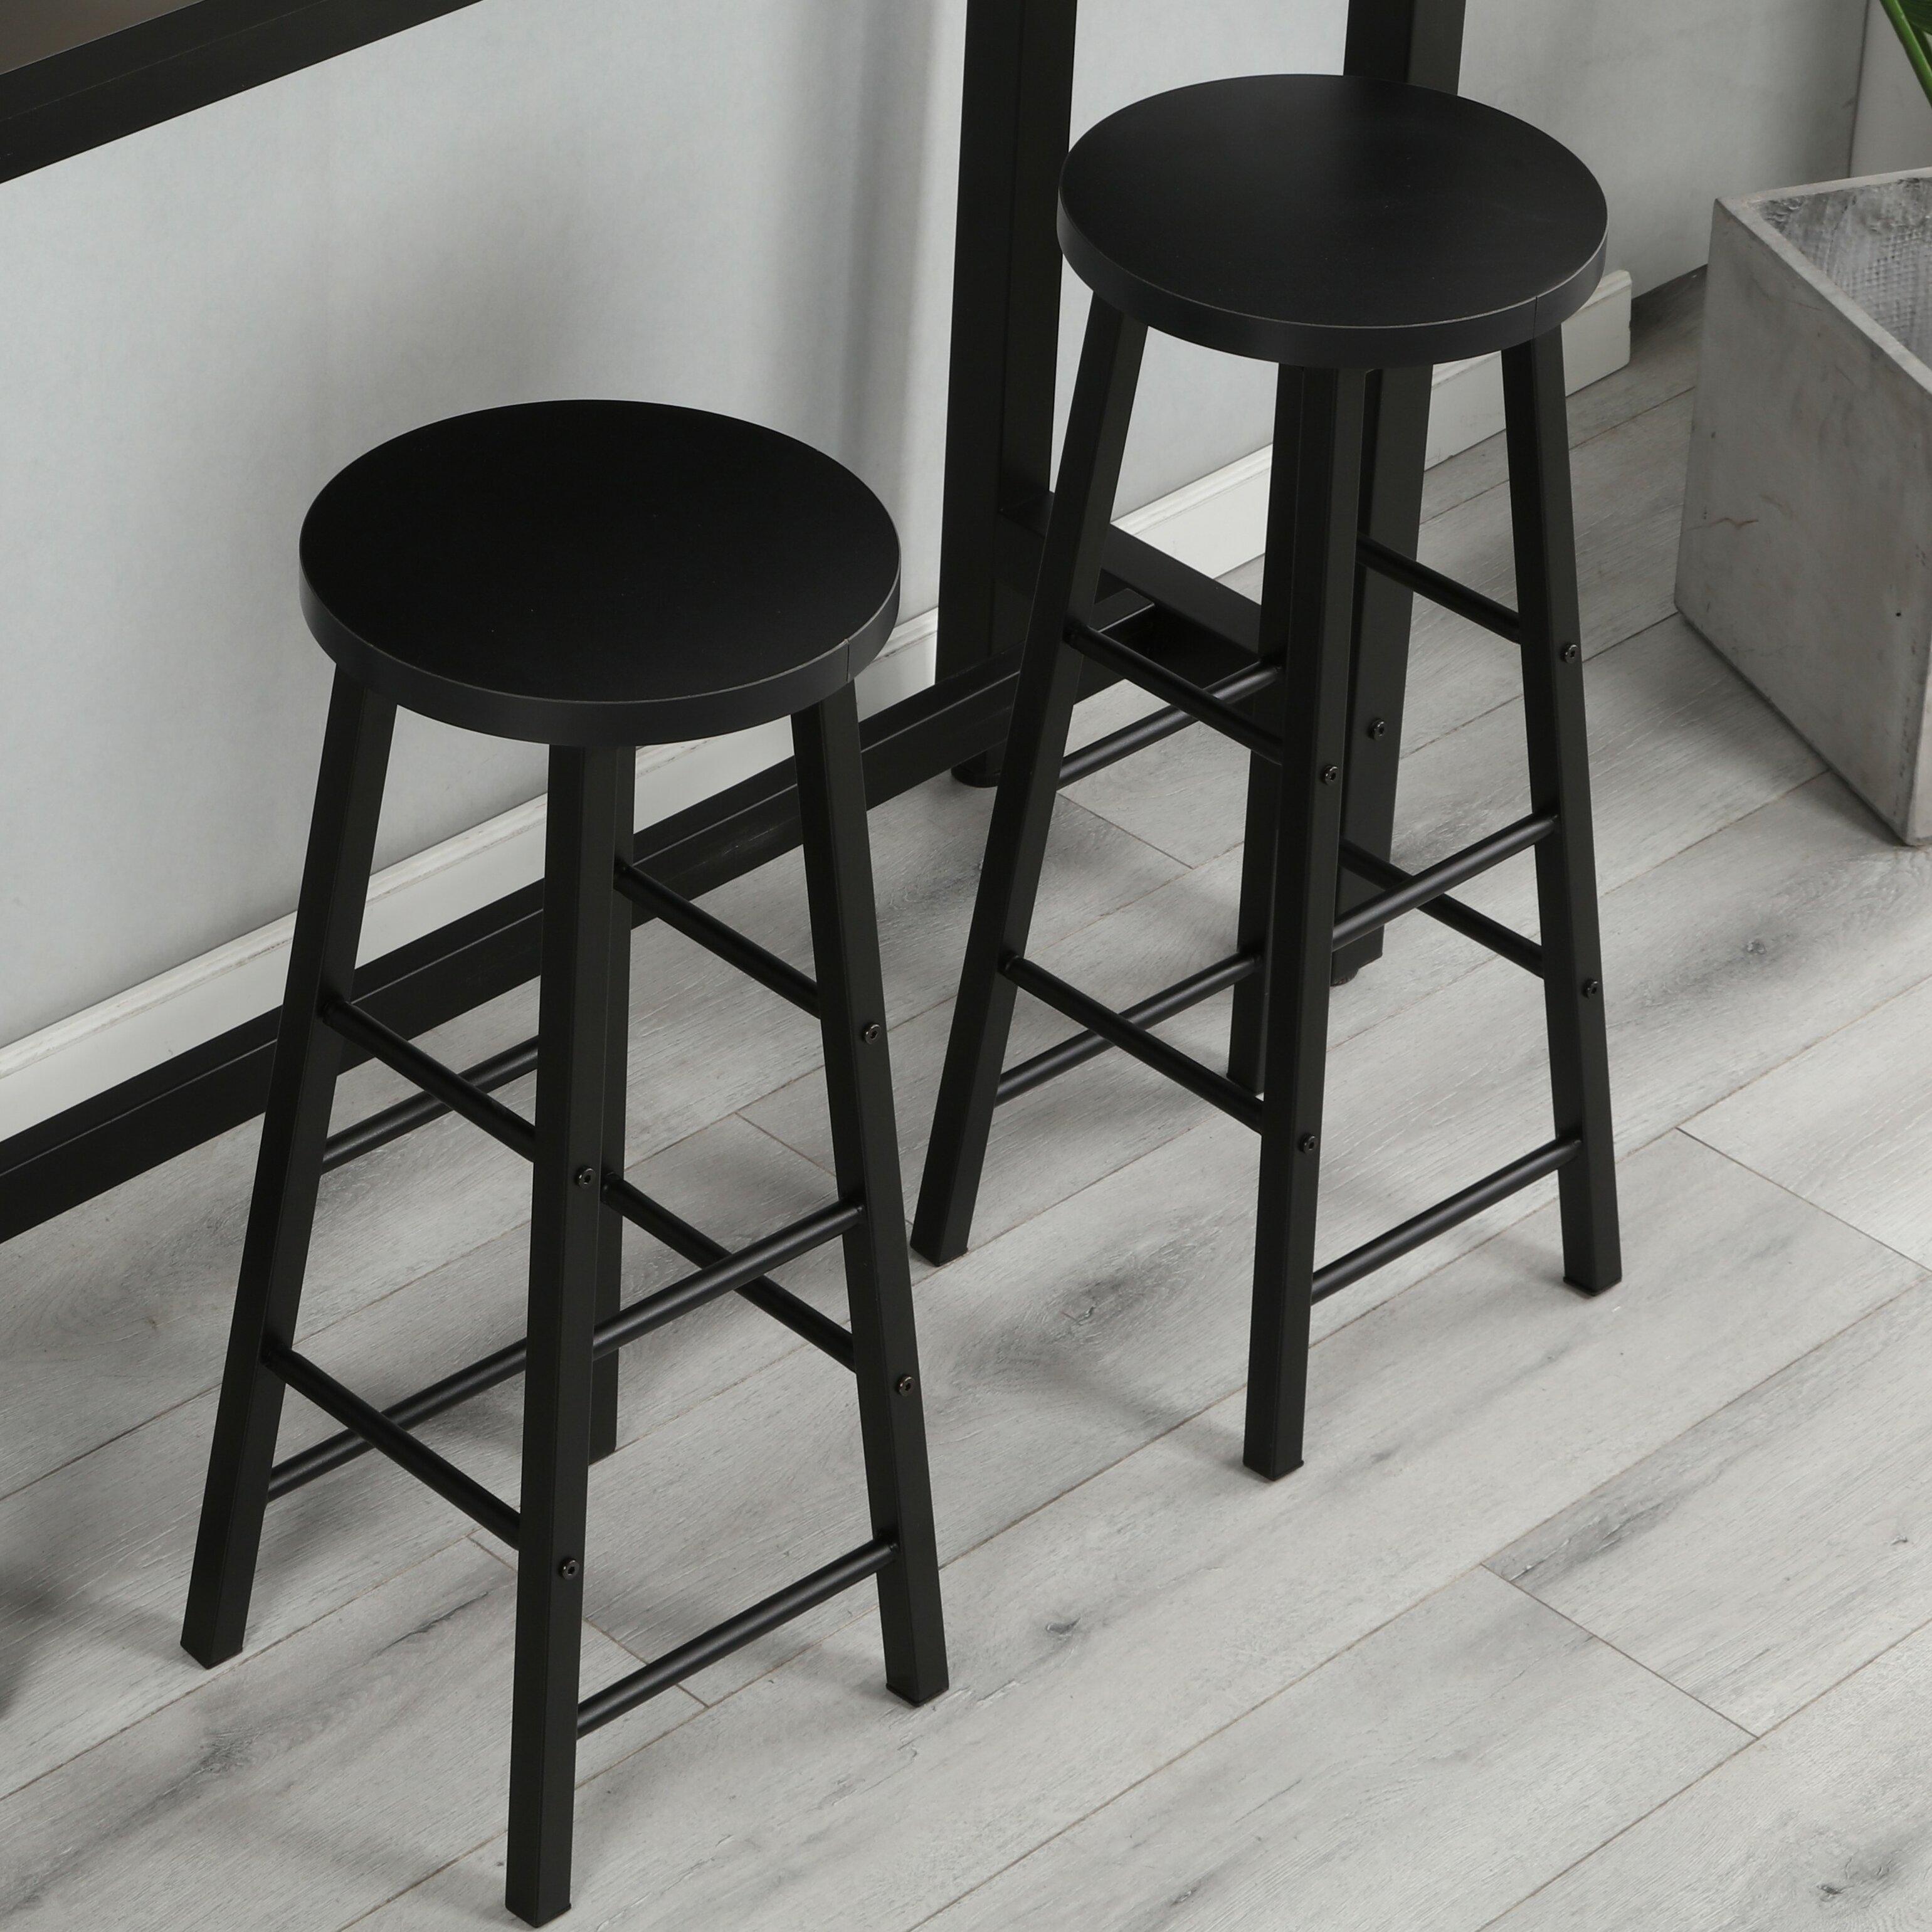 Stupendous Cota Bar Stool Set Of 2 Spiritservingveterans Wood Chair Design Ideas Spiritservingveteransorg